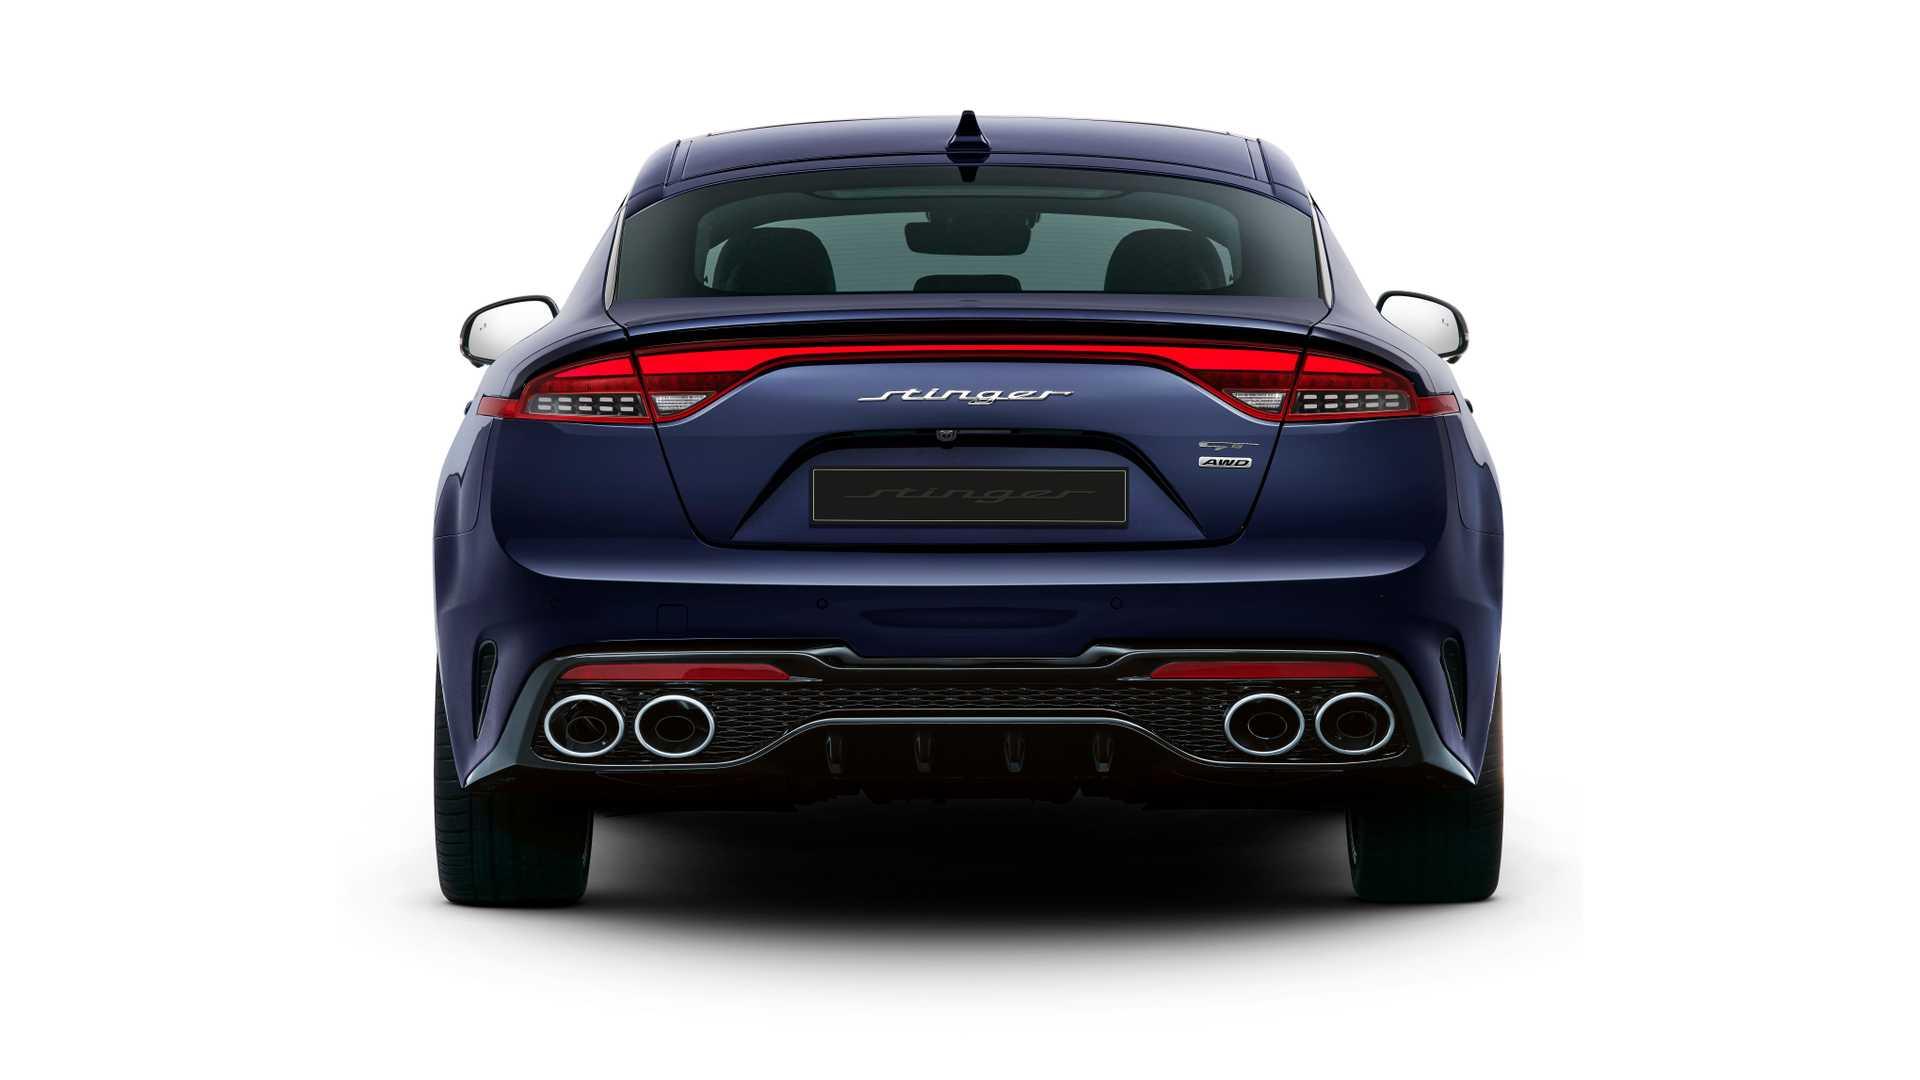 2021 Kia Stinger facelift